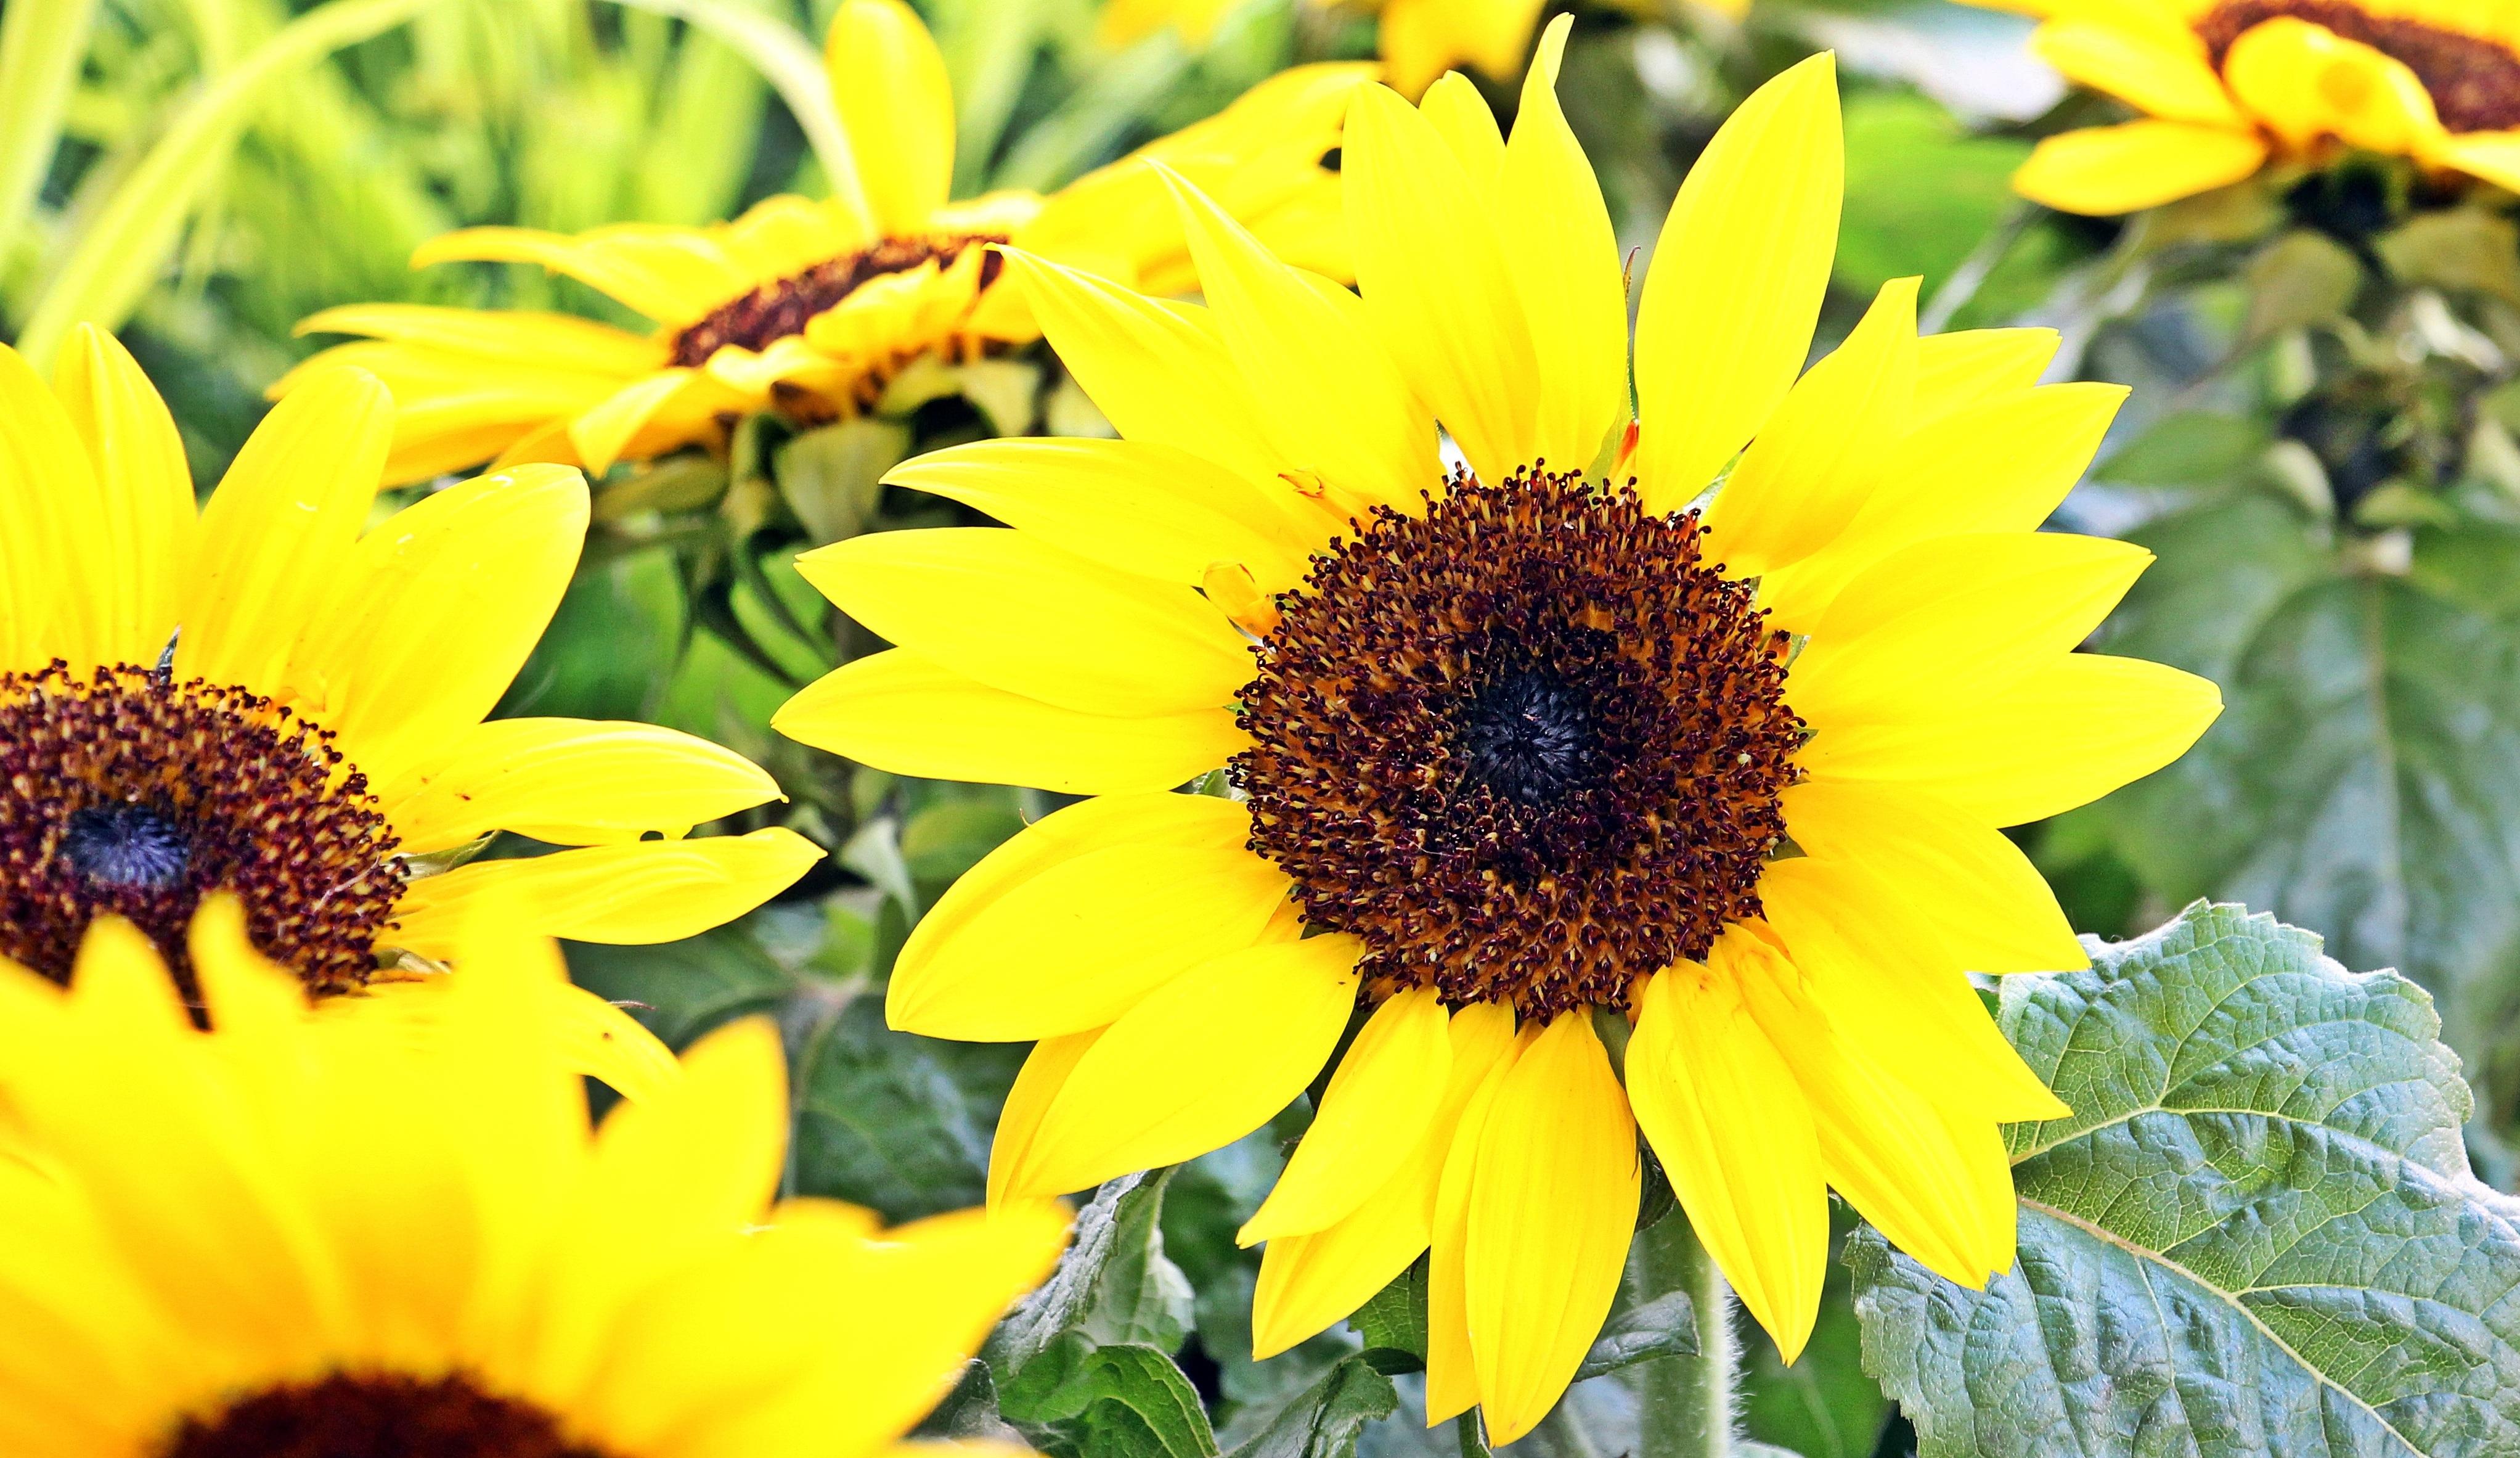 Sunflower Field, Blooming, Field, Flower, Fragrance, HQ Photo